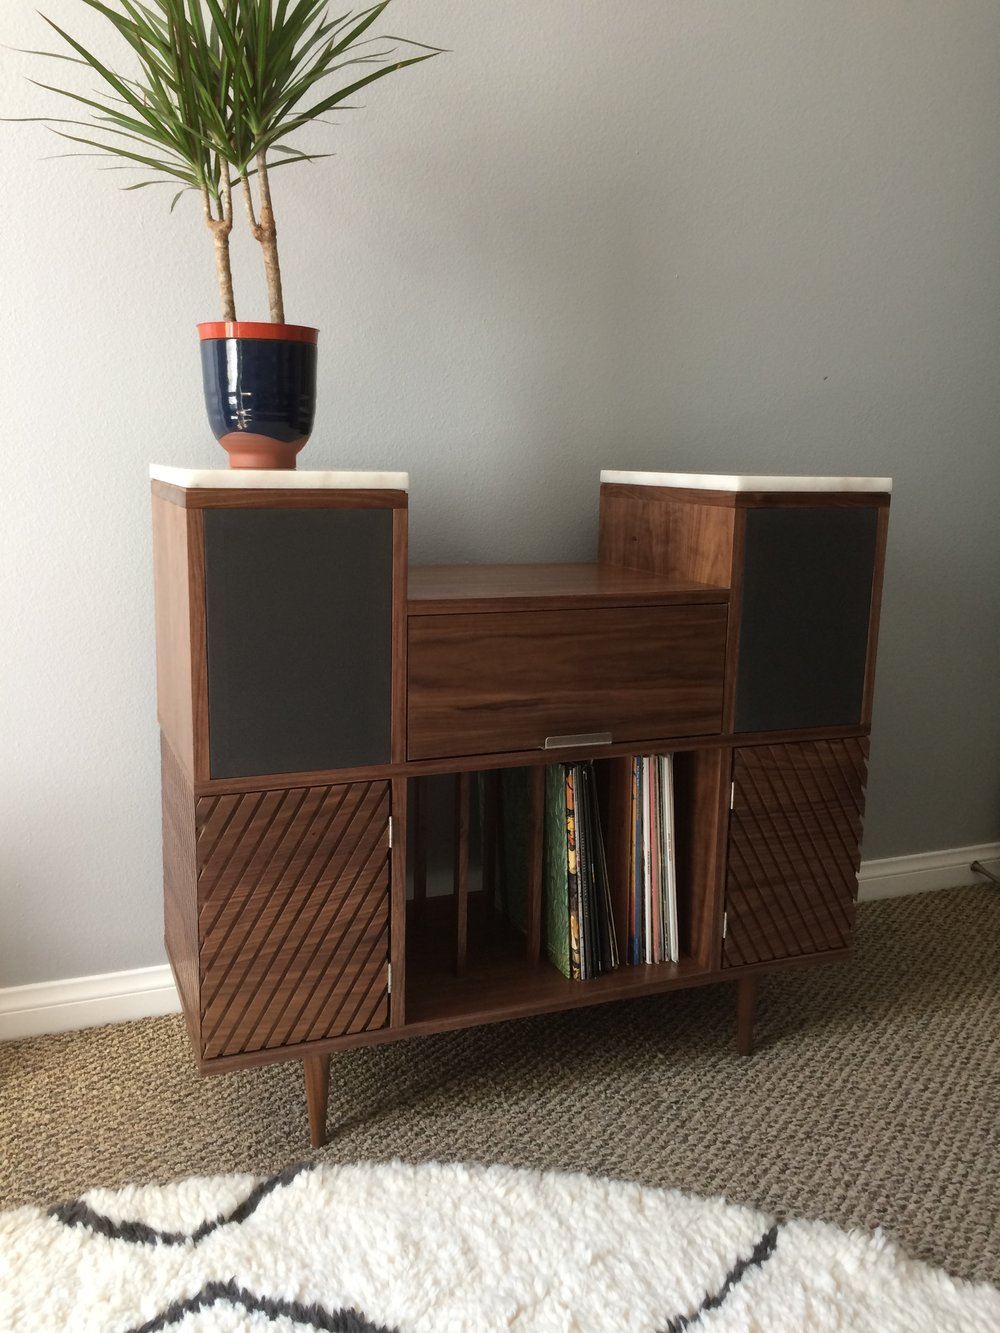 The Michael Scott Record Cabinet